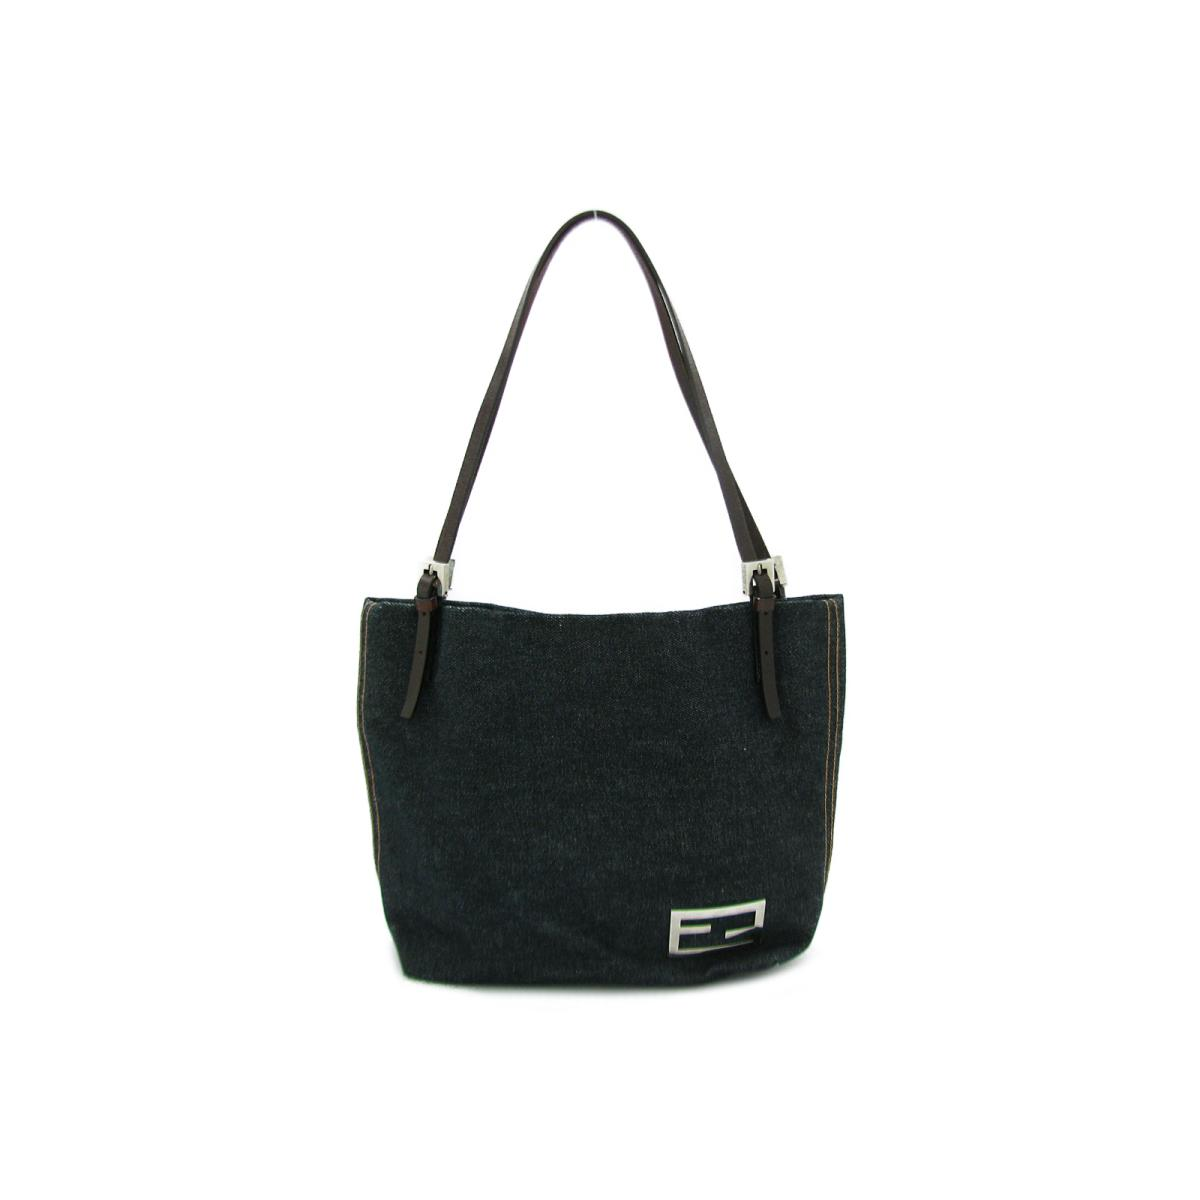 3f29a1a7e6fa BRANDOFF  Authentic FENDI Shoulder tote Bag denim indigo x Brown ...